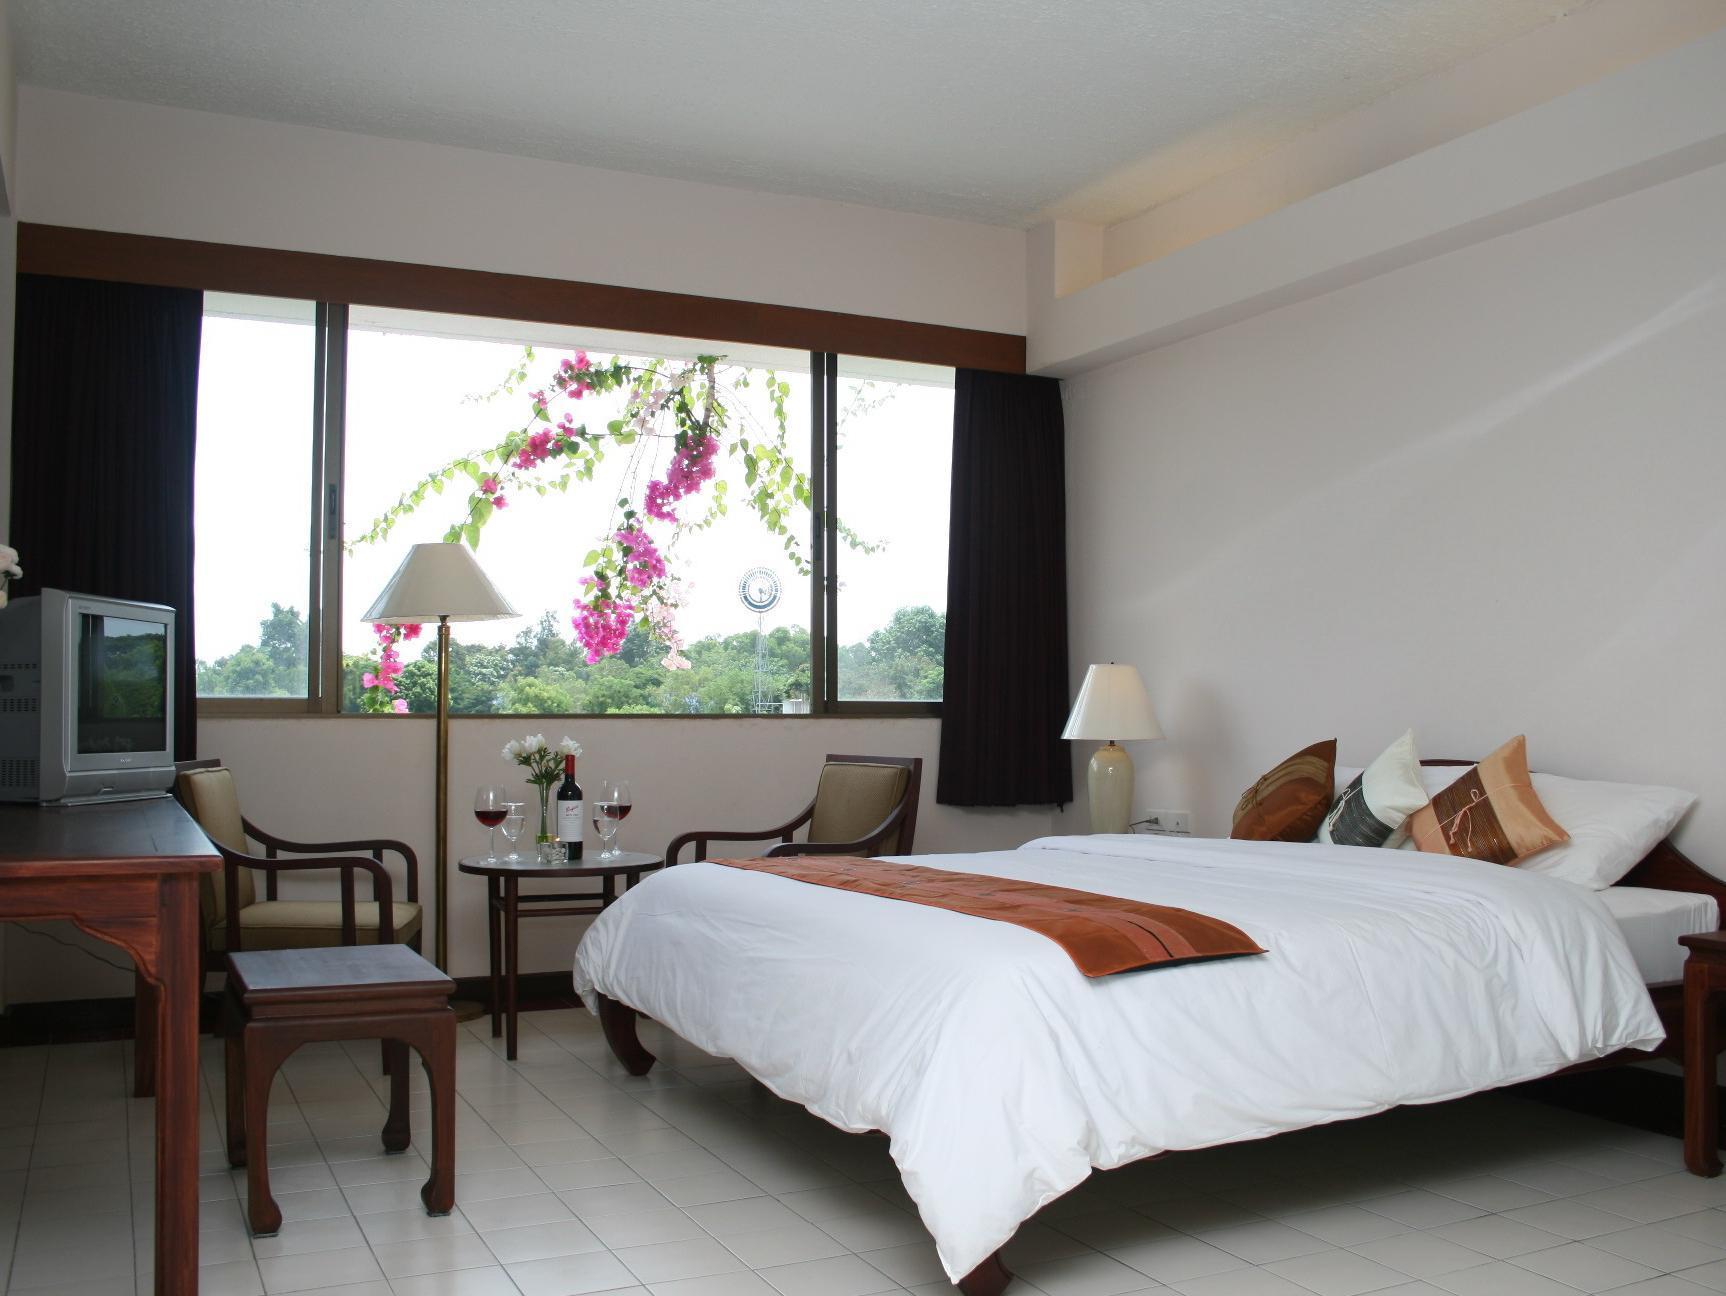 Mae Pim Resort Hotel,แม่พิมพ์ รีสอร์ท โฮเต็ล